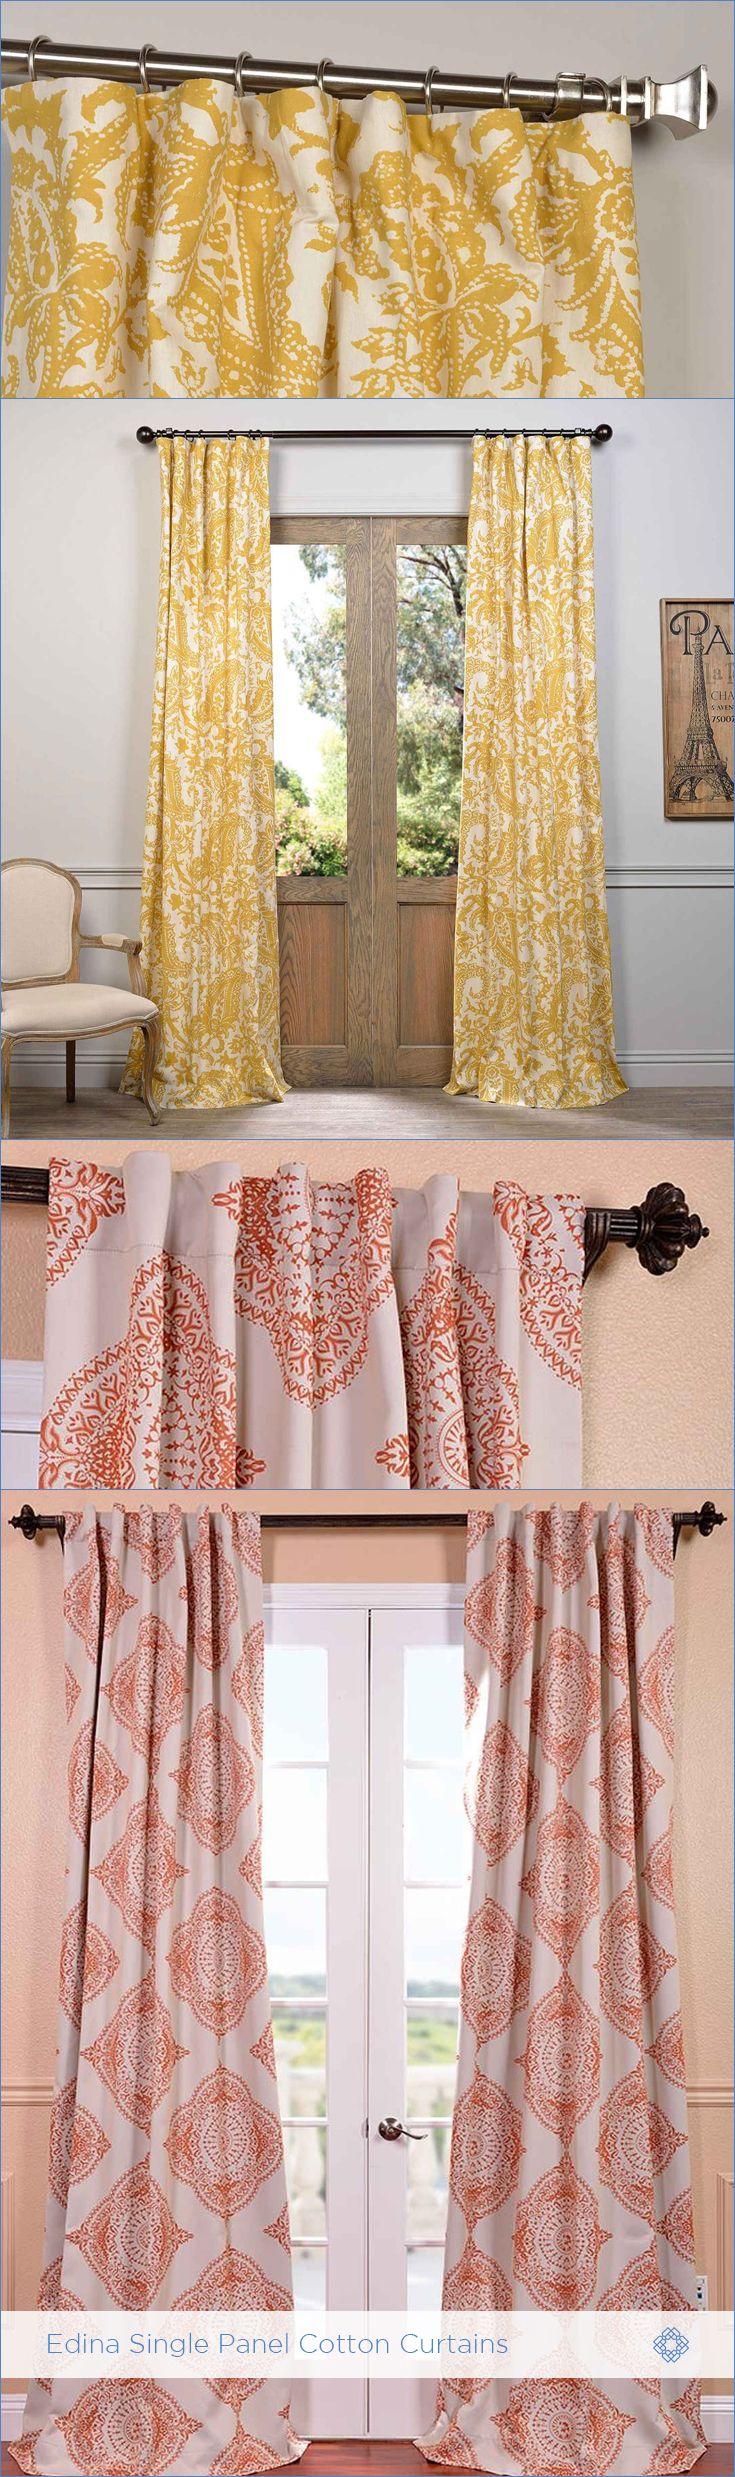 Exclusive fabrics painted chevron printed cotton curtain free - Shop For Exclusive Fabrics Edina Printed Cotton Curtain Panel From The Simplicity Of Modern Geometric